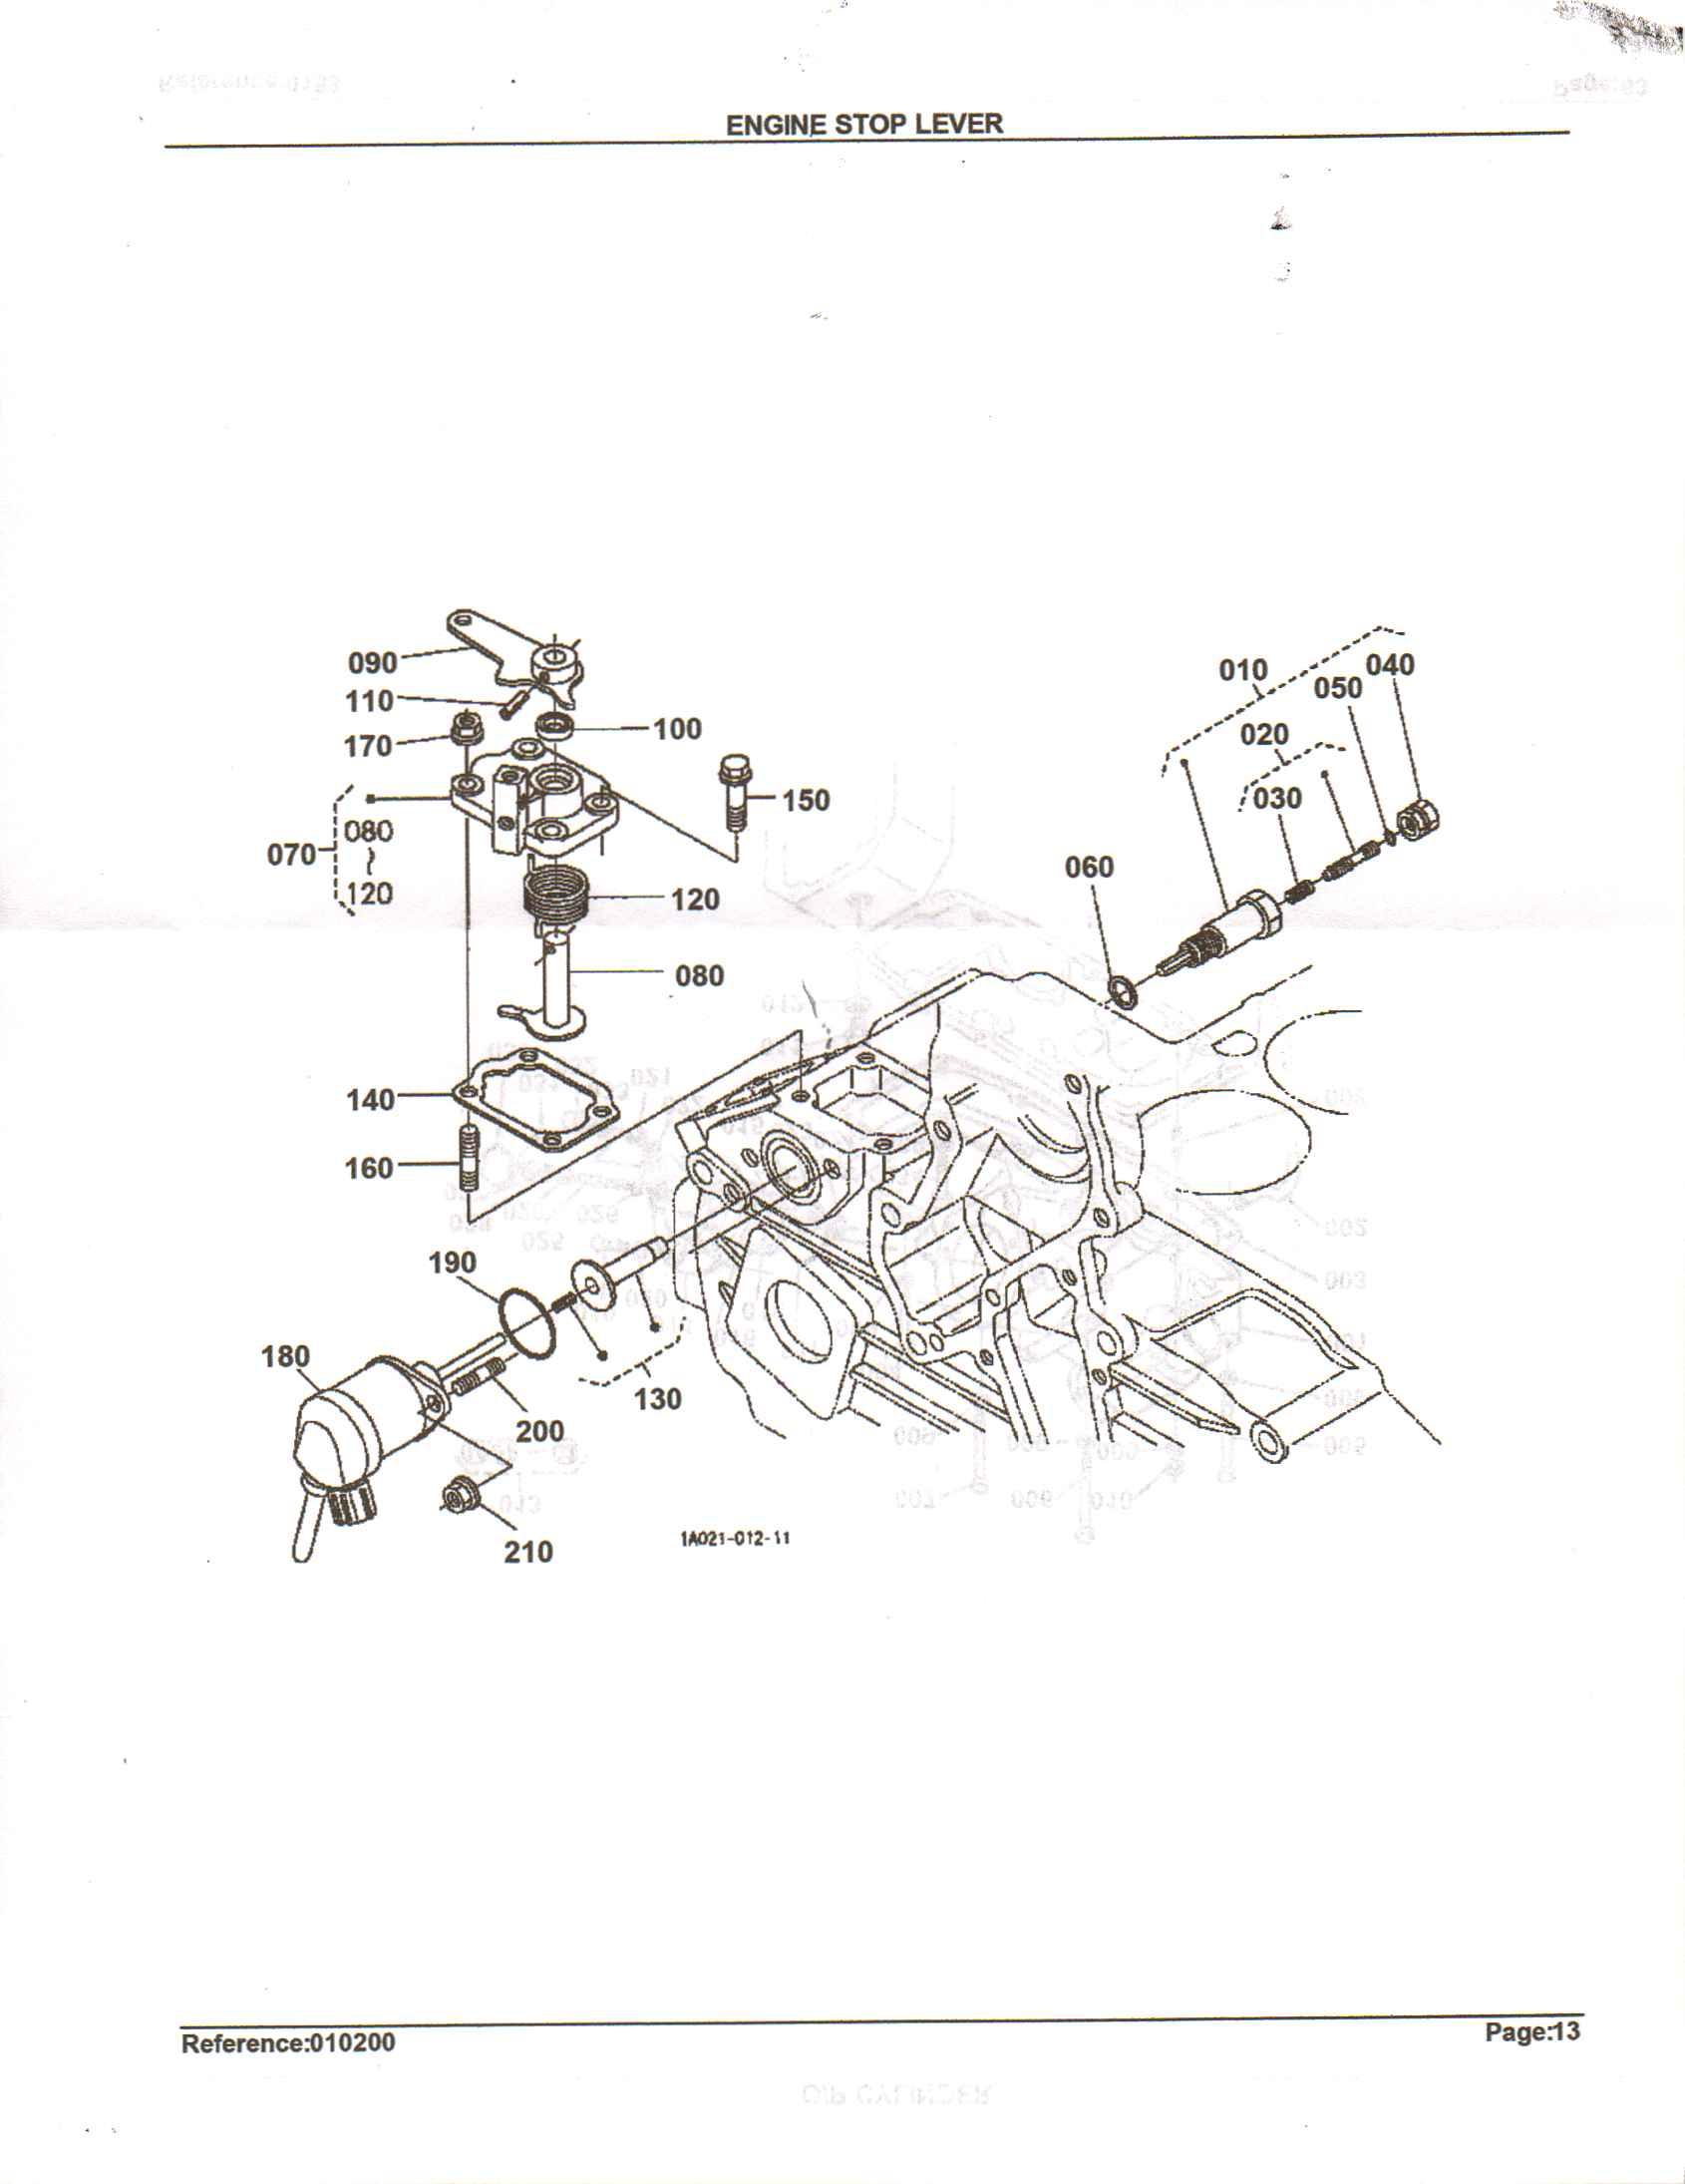 Kubota Fuel Solenoid Wiring Diagram Daily Update Excavator Diagrams L48 Tractor Rtv 900